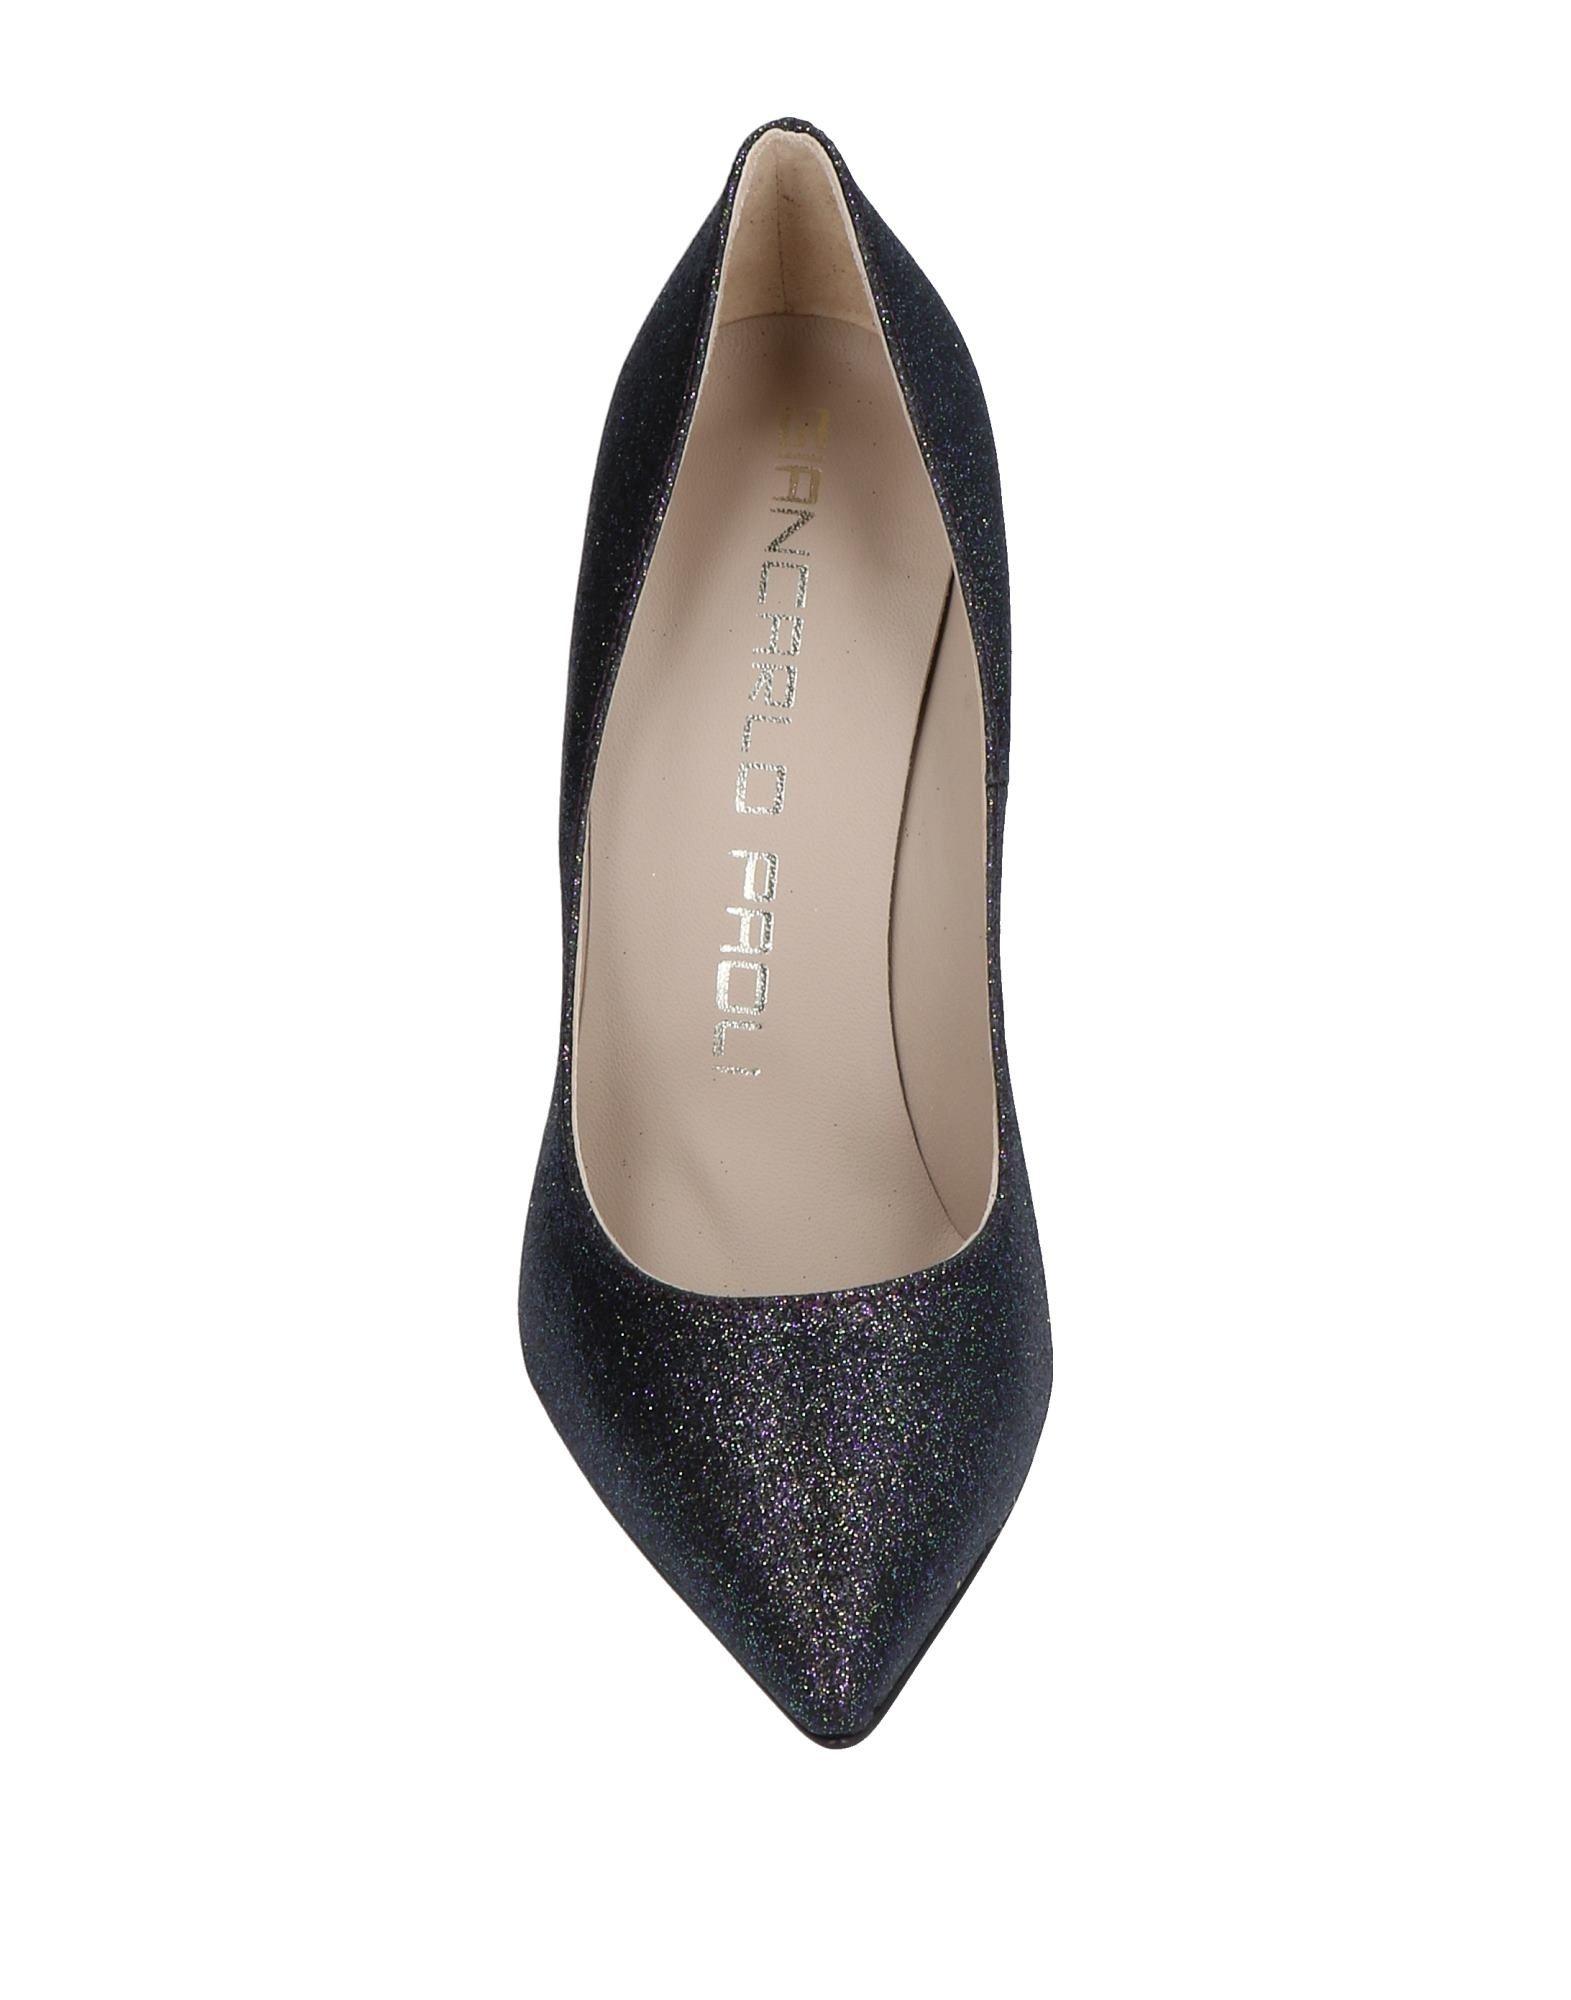 Stilvolle billige Schuhe Damen Giancarlo Paoli Pumps Damen Schuhe  11479371HI e223a5